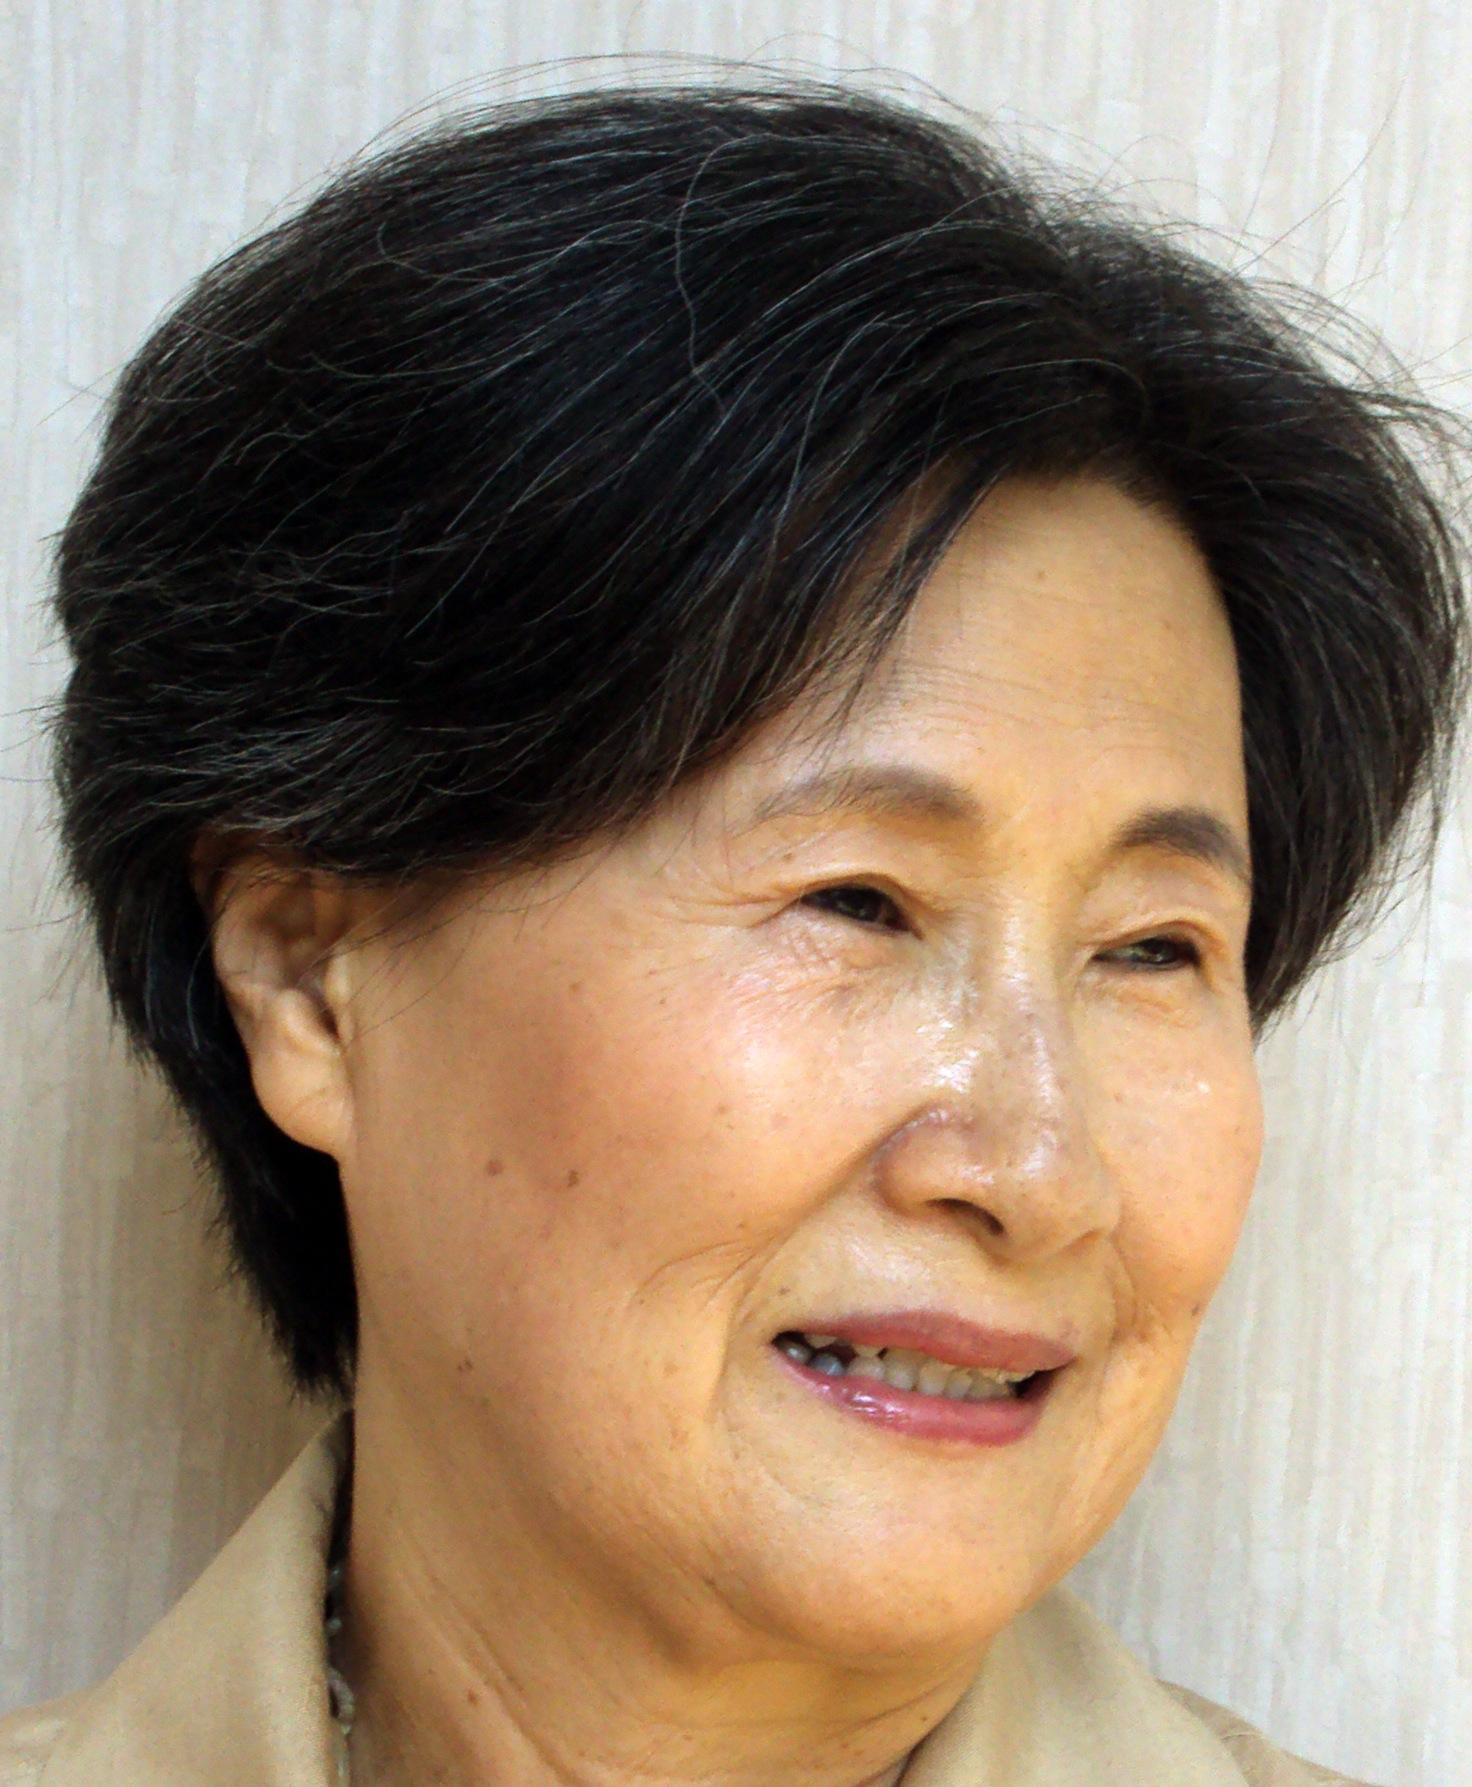 Sook Nyul Choi, 2009